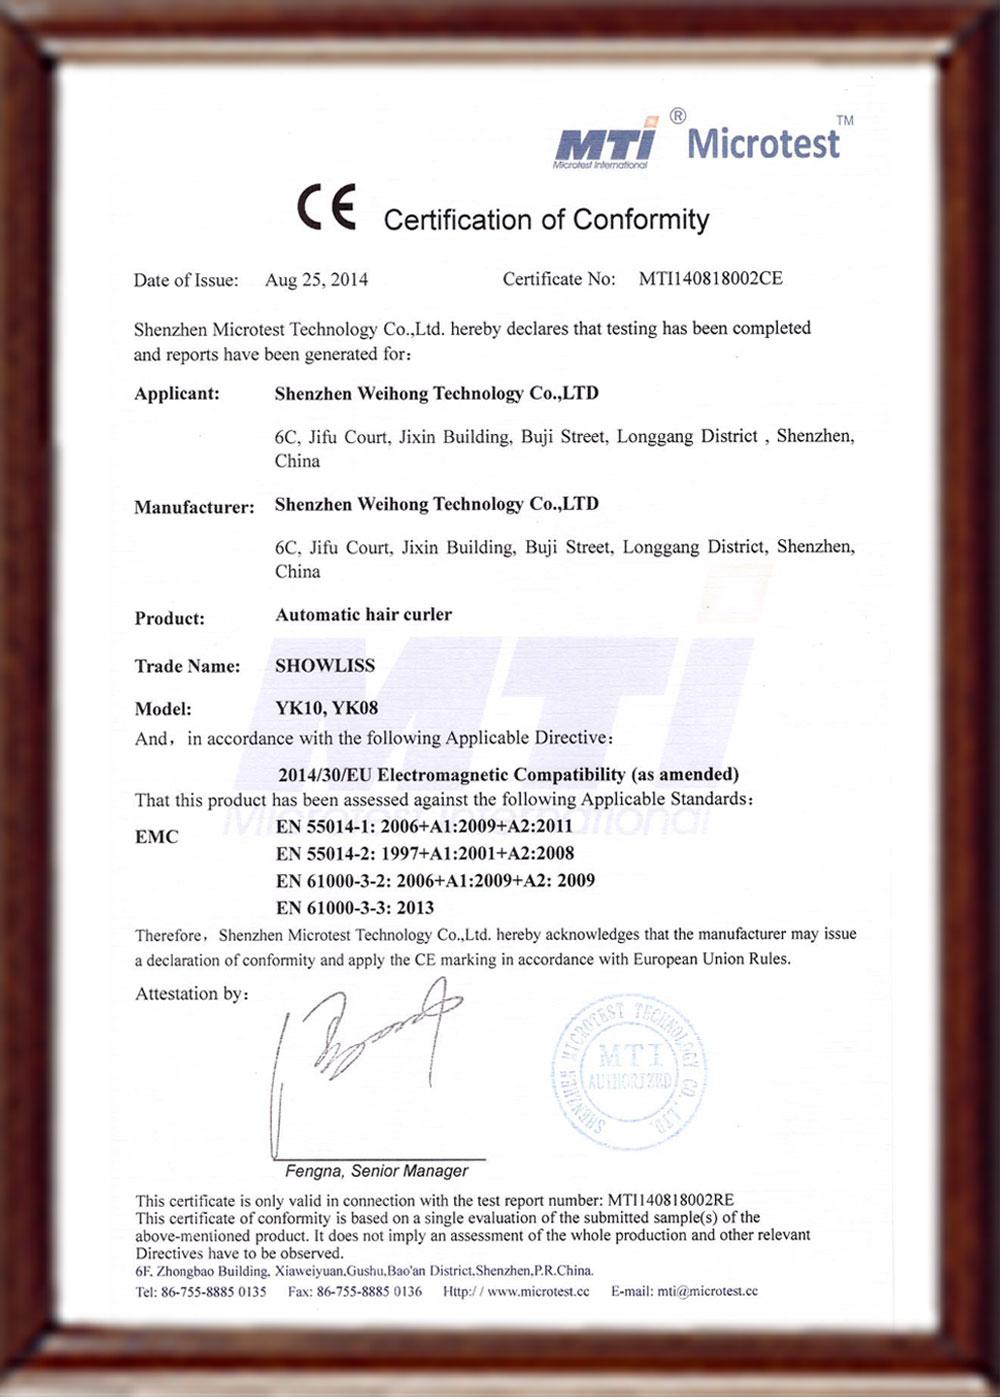 YK10 CE certificate